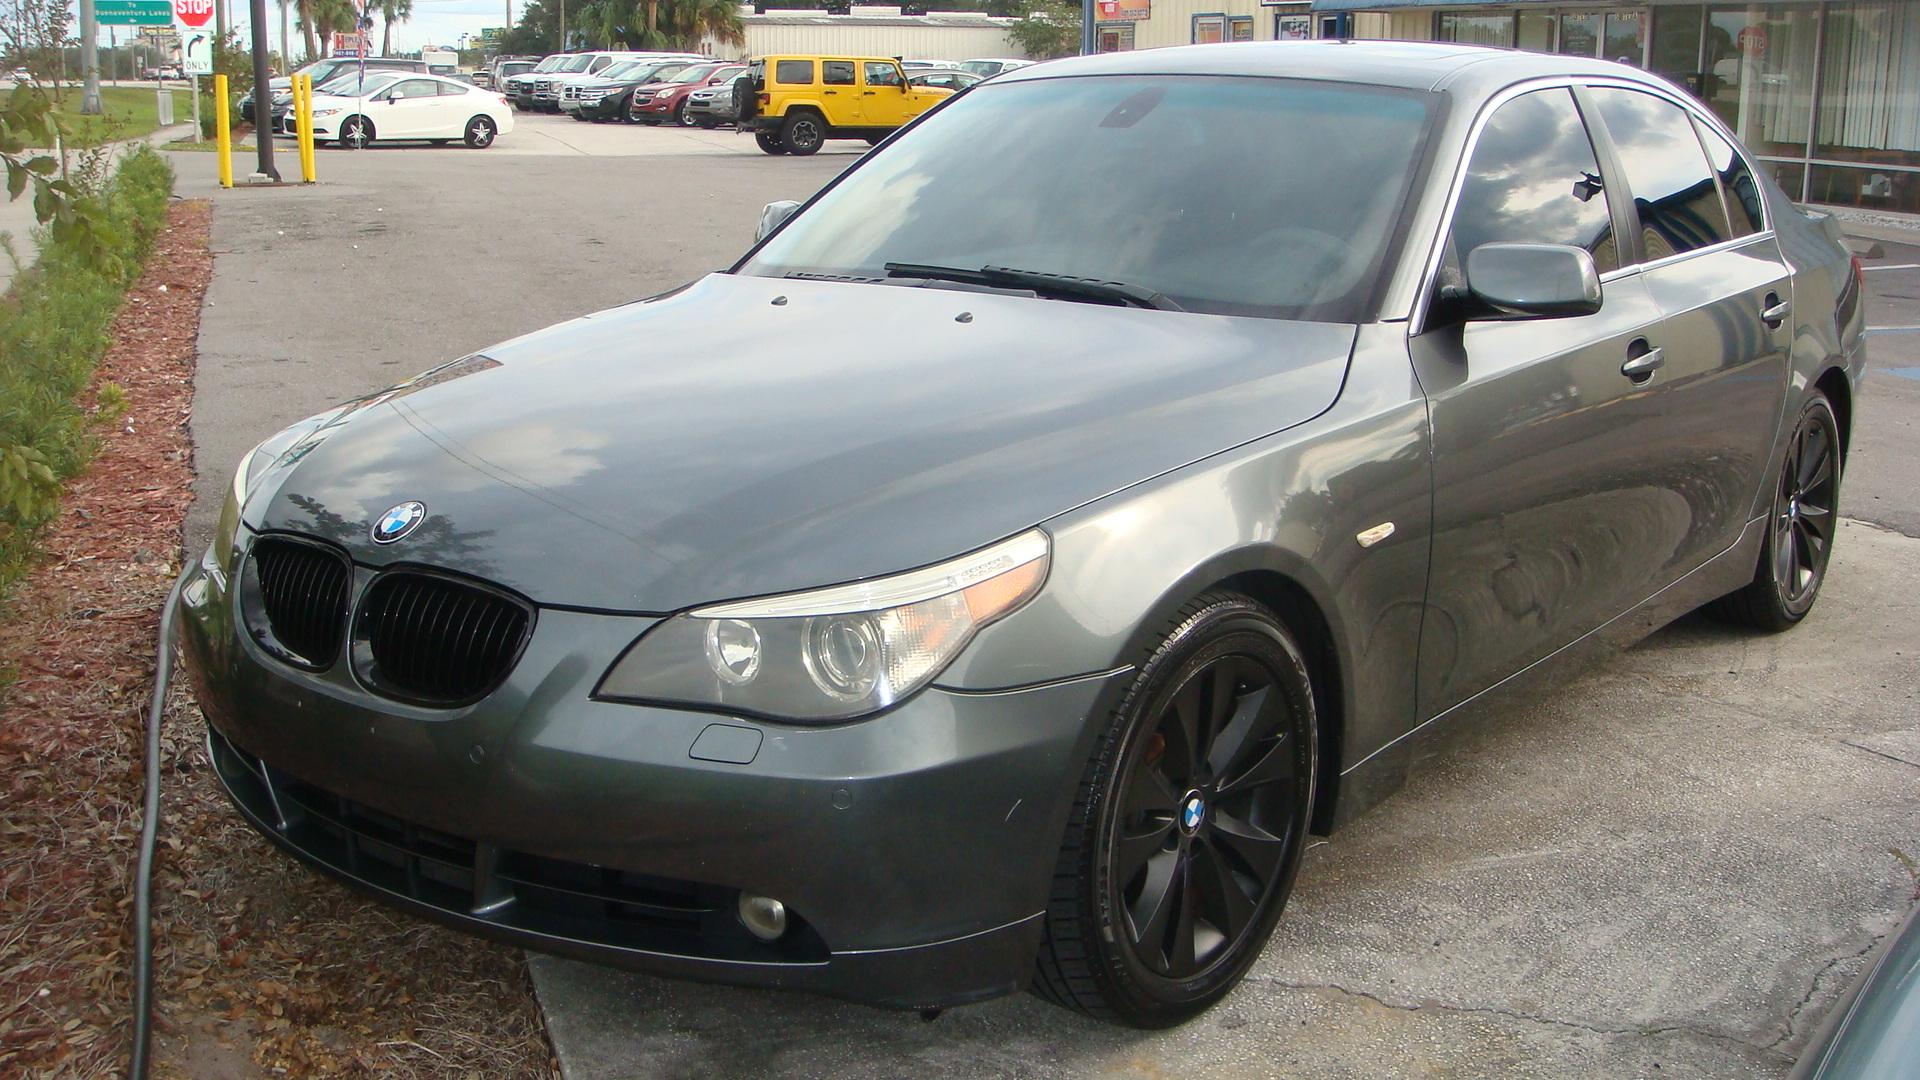 BMW I GRAY Marios Auto Sales Used Car Dealer - Bmw 540i 2005